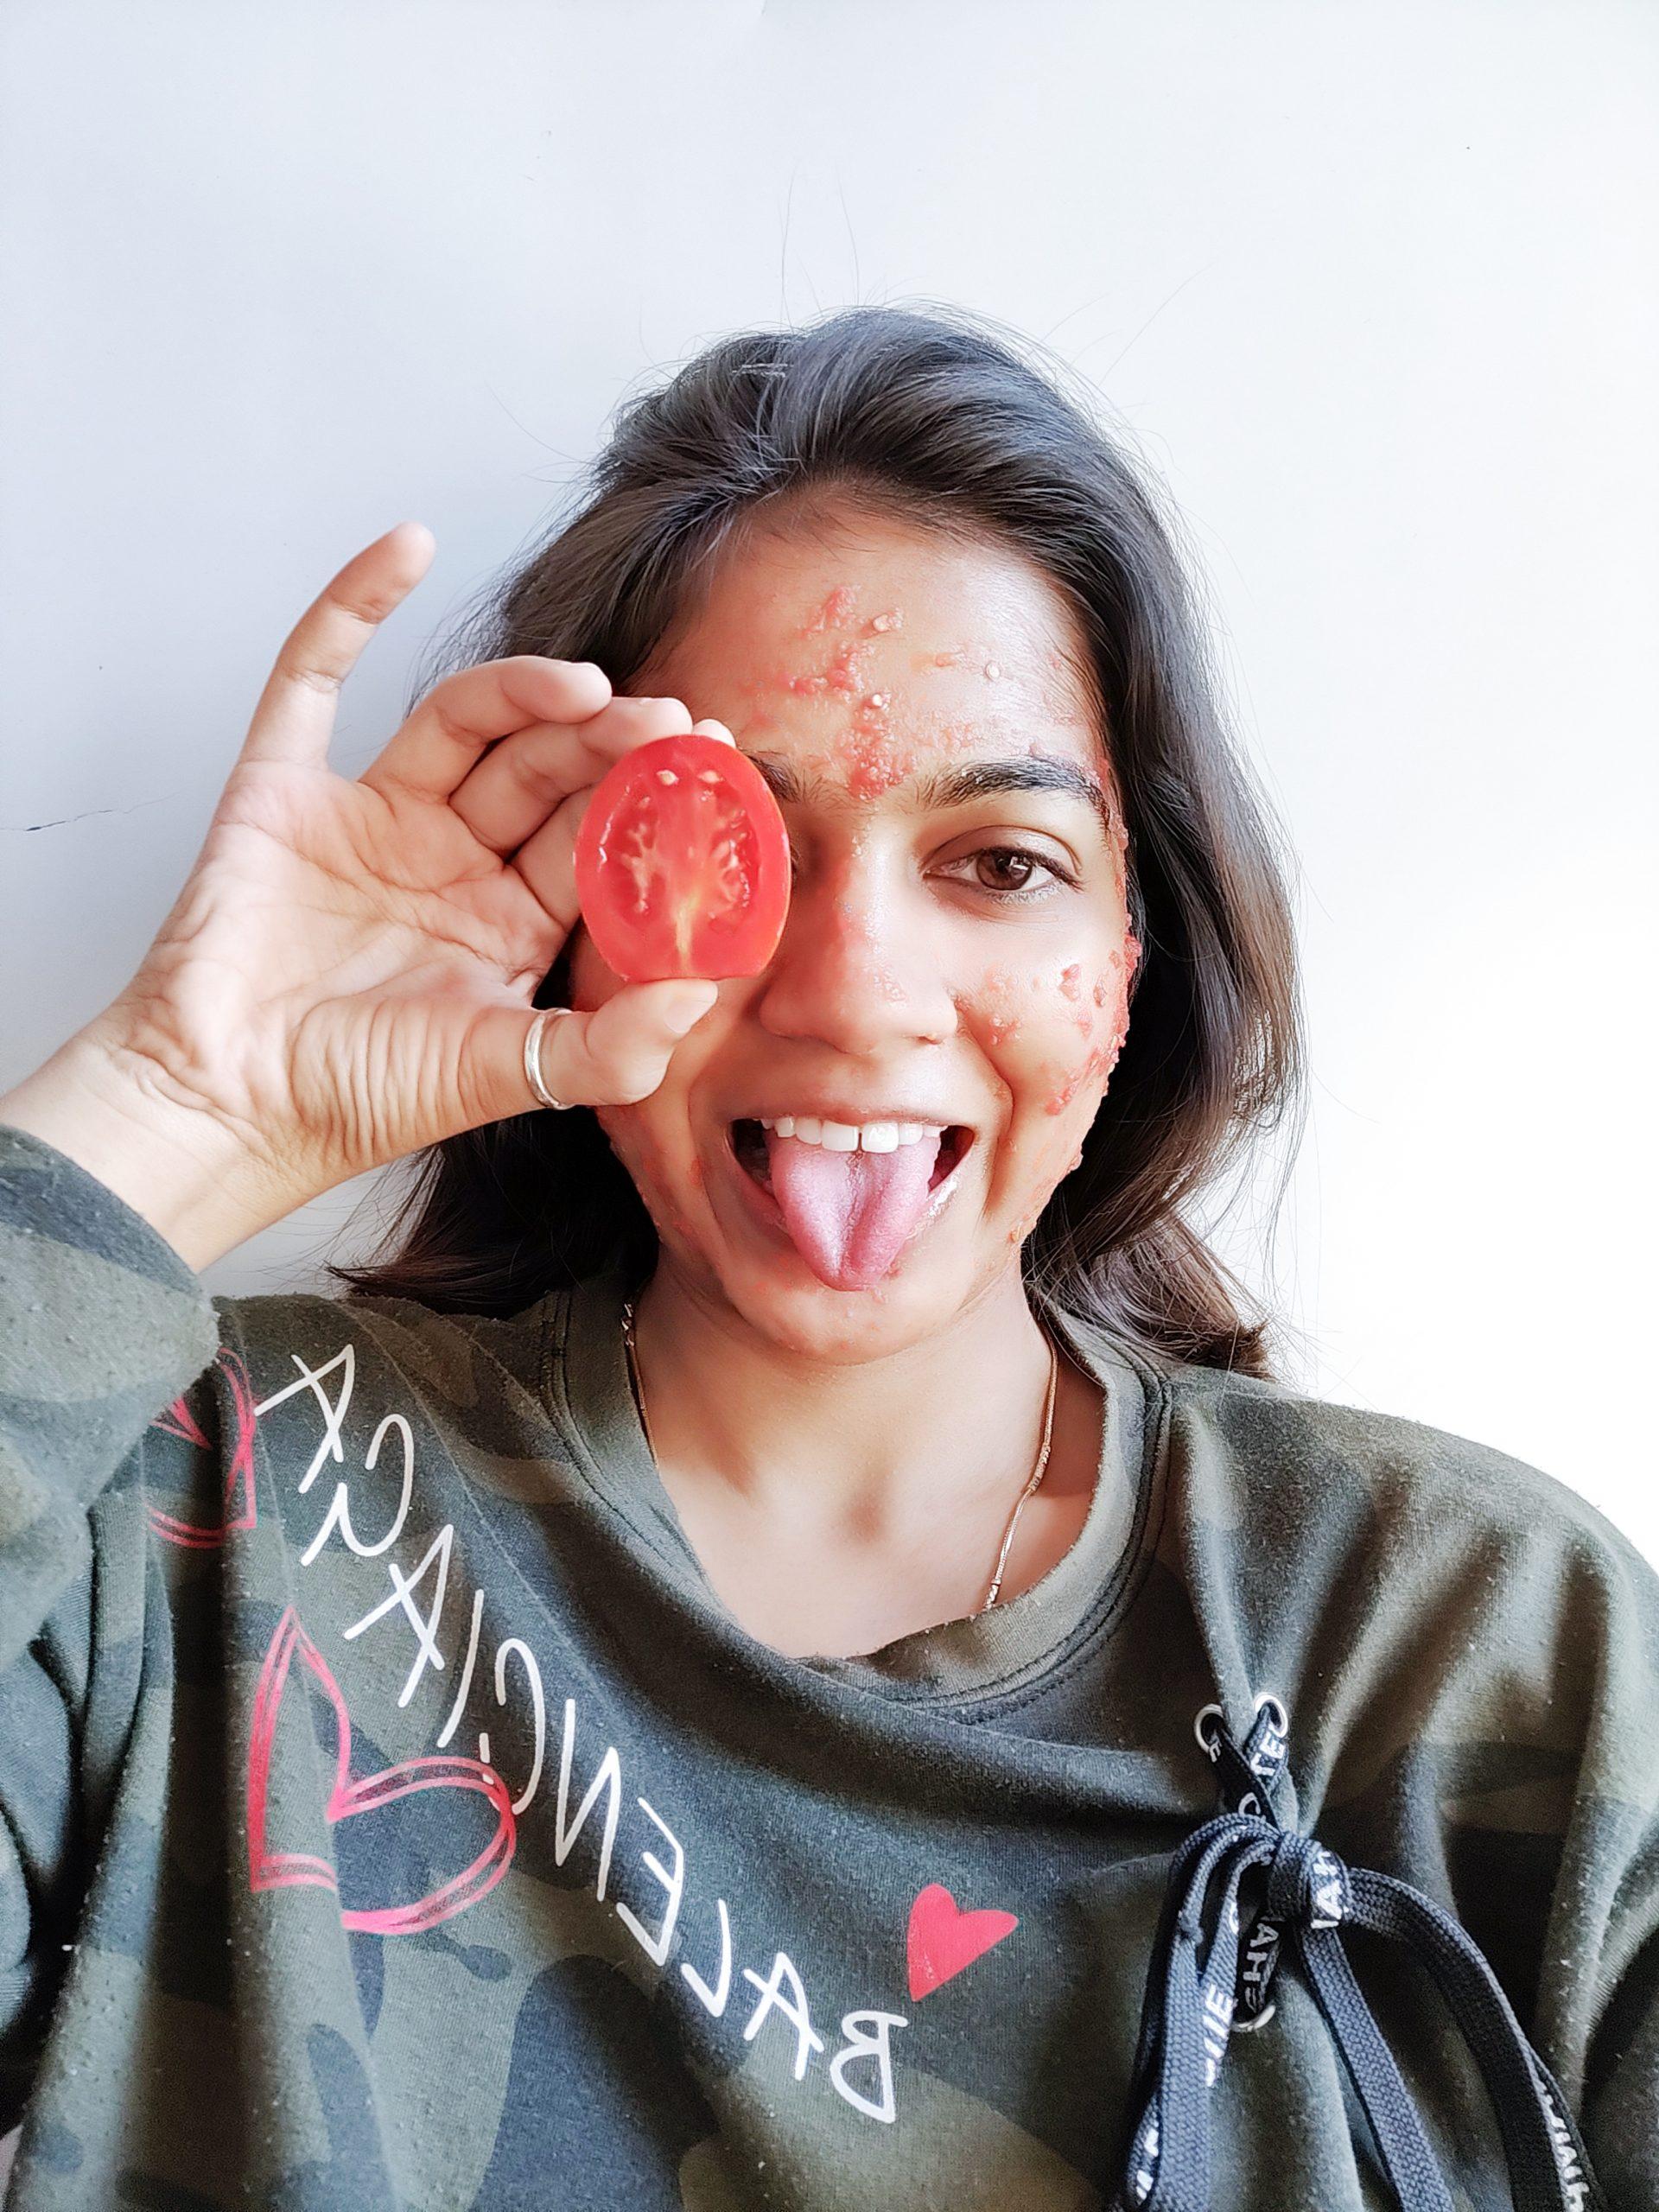 A girl applying tomato face mask